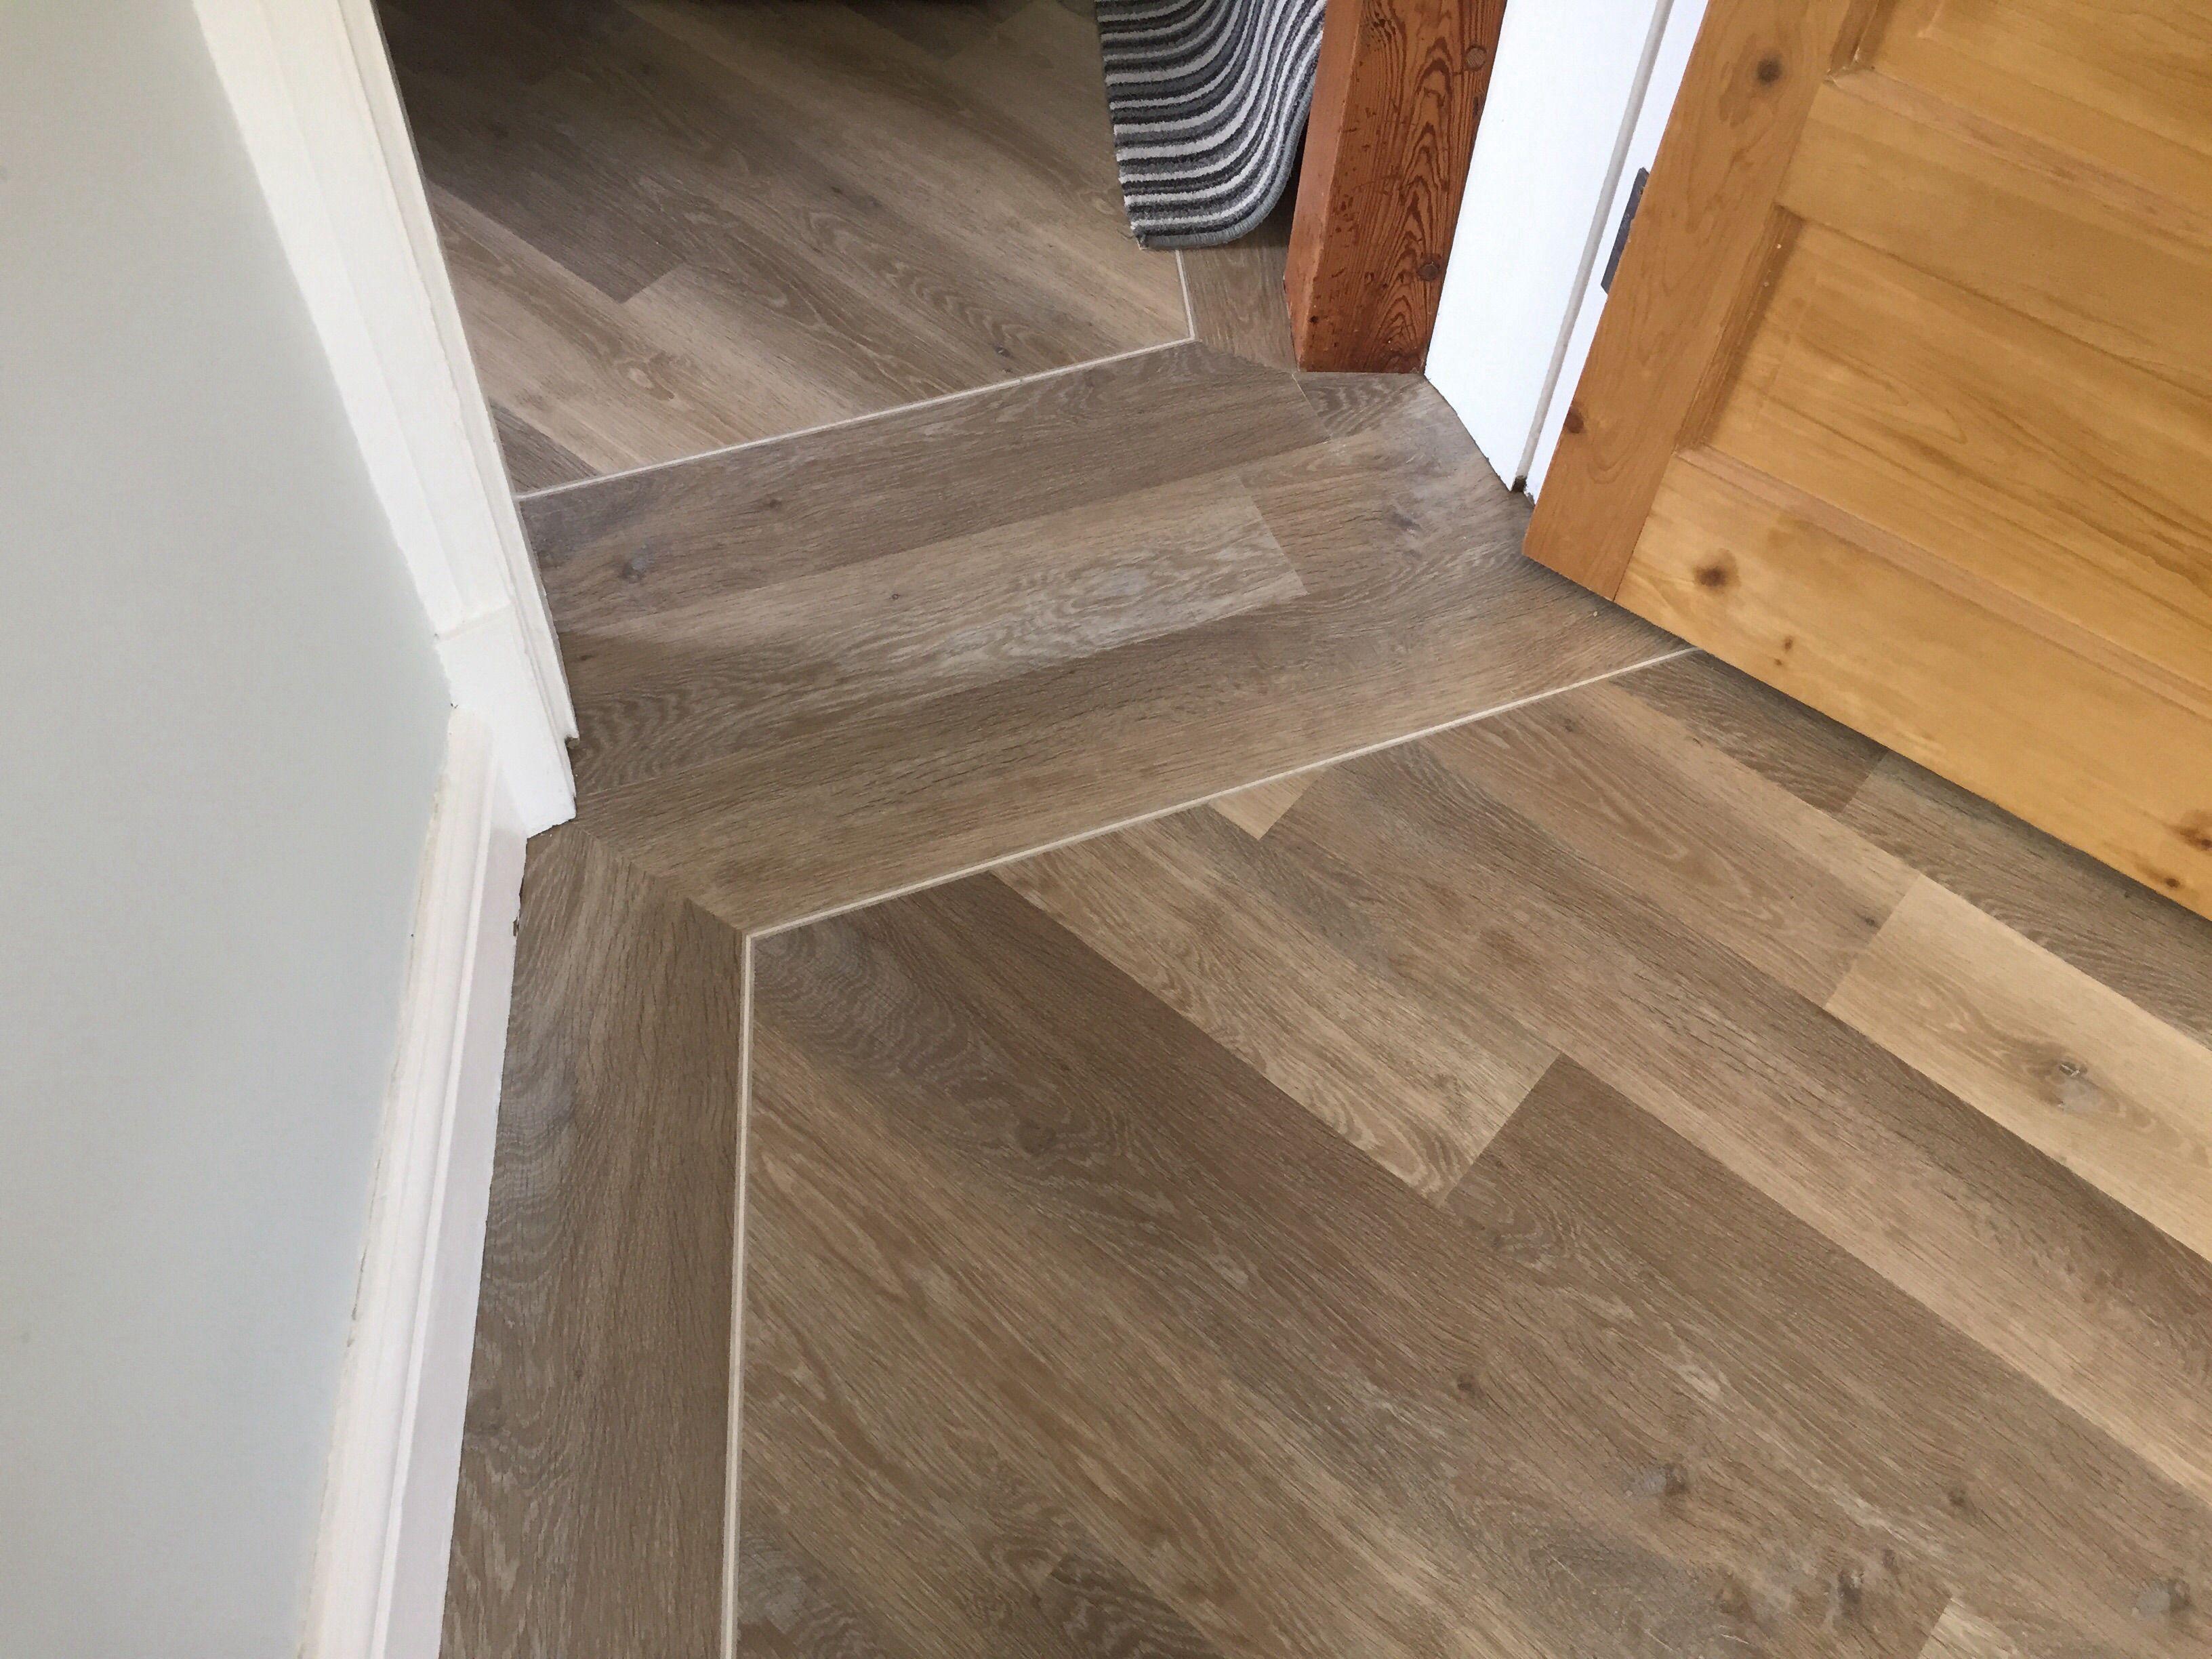 floor walnut chicago refinishing flooring services hardwood youtube watch